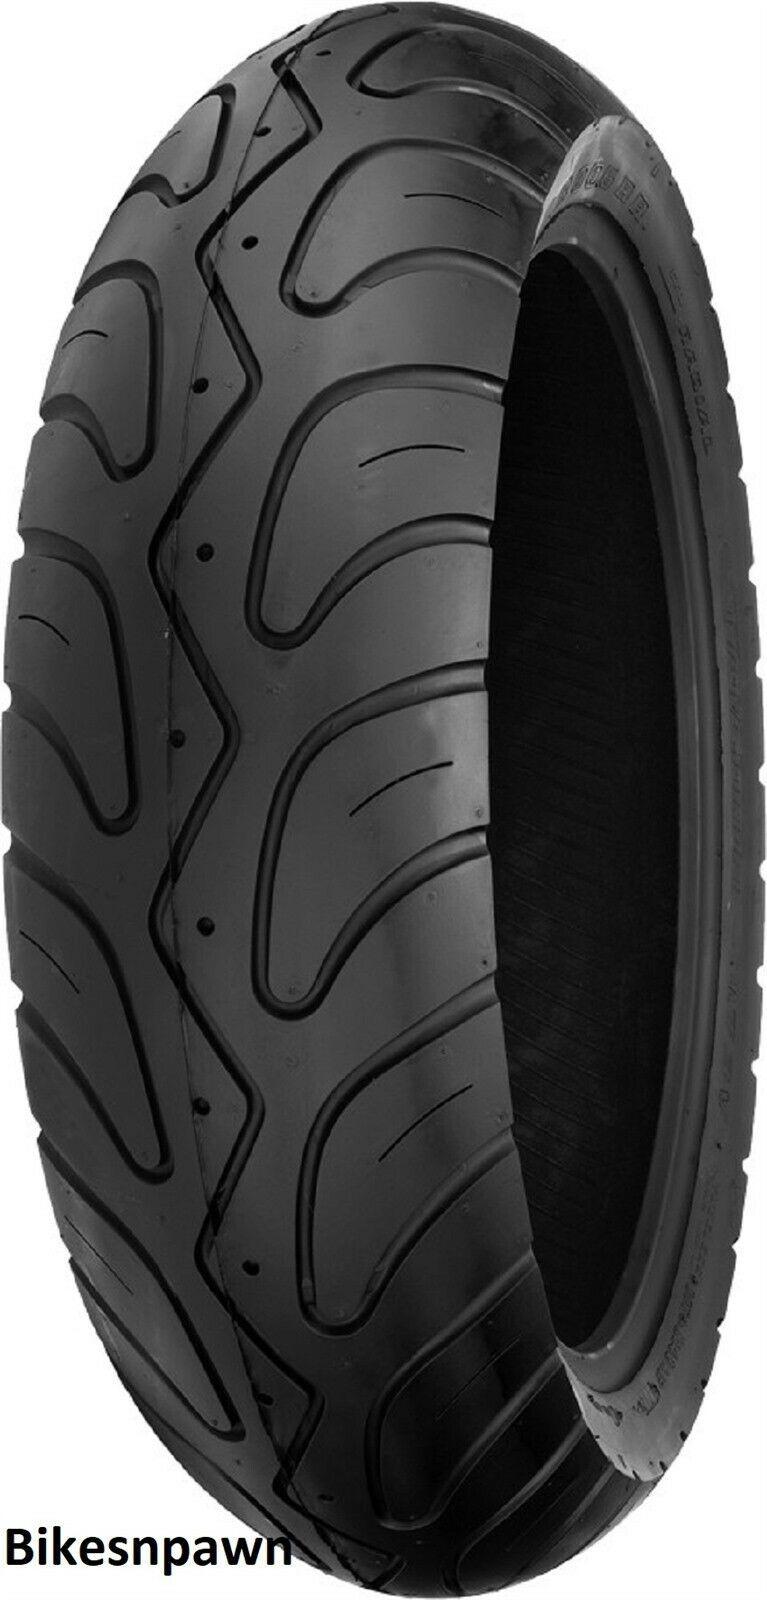 New Shinko 006 Podium Radial 160/60R17 Rear Motorcycle Performance Tire 69W